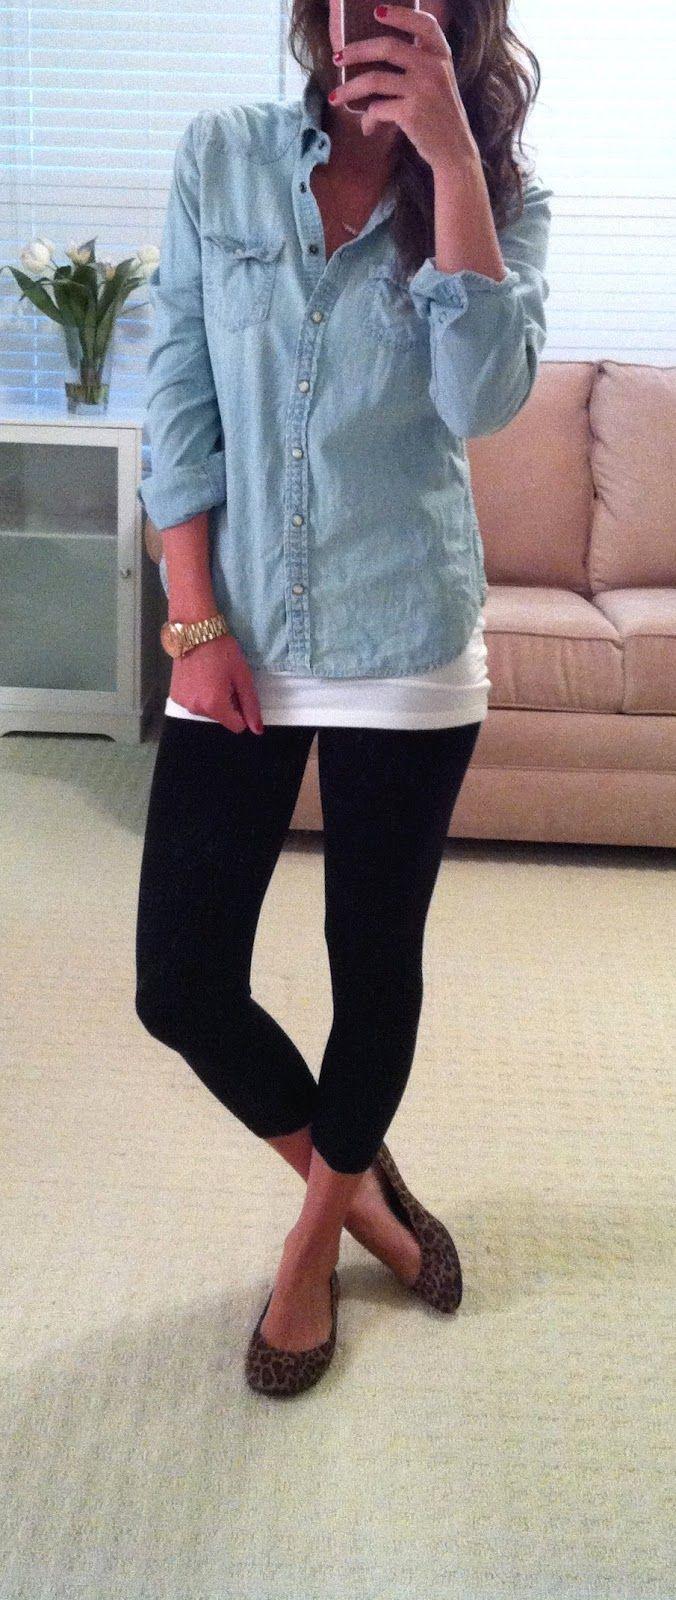 Leggings long white tank denim shirt cute my fashion sense